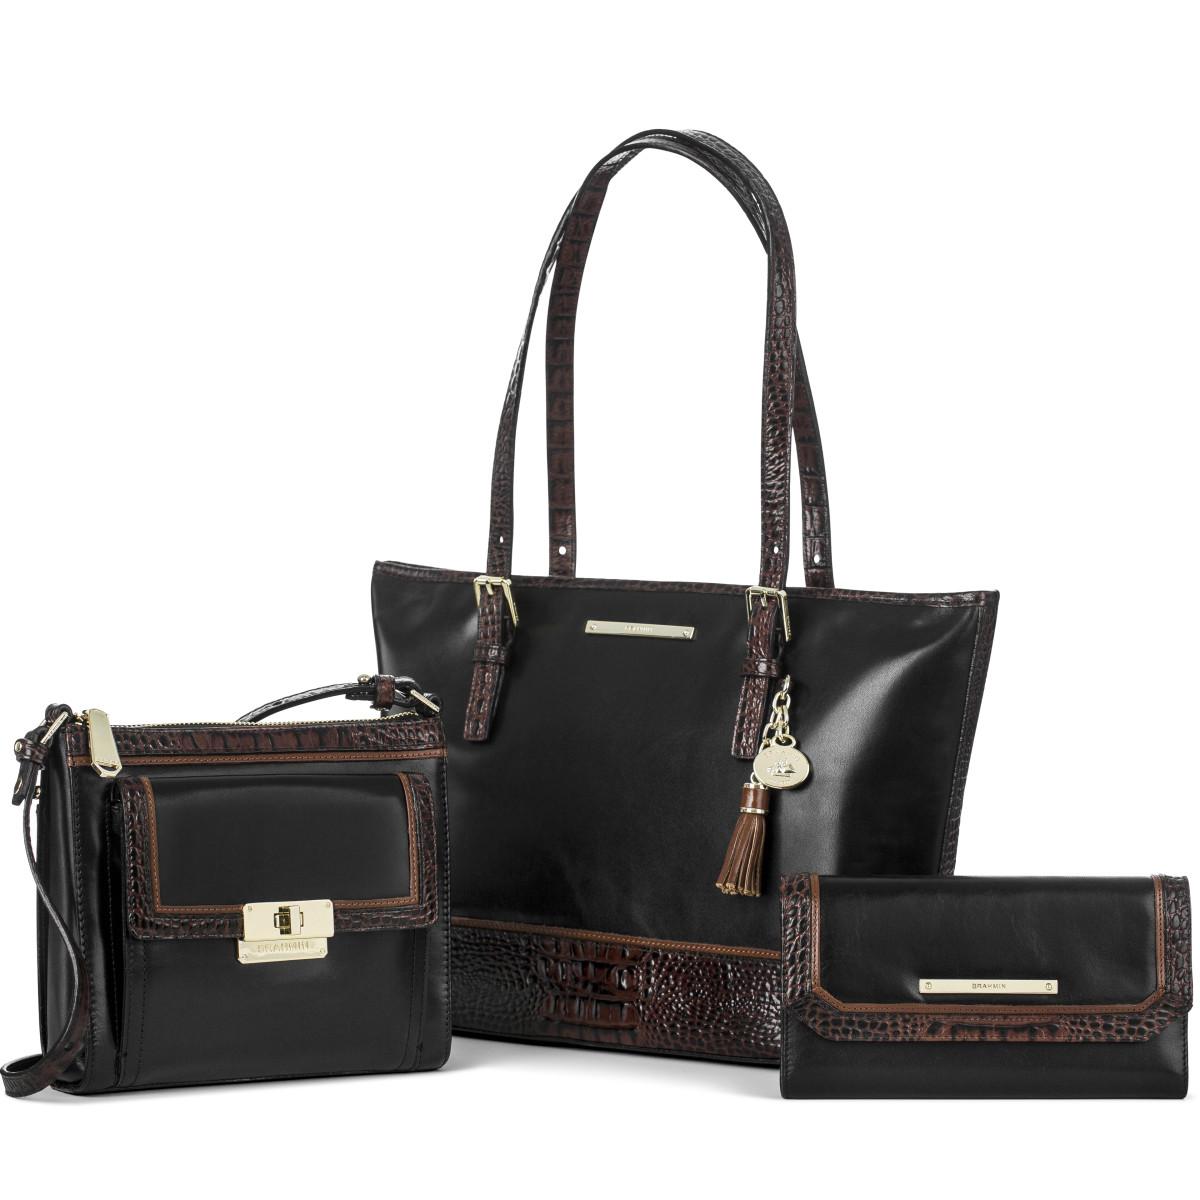 c5ef05819 Handbag designer details hot colors, style advice & fashion mistakes ...